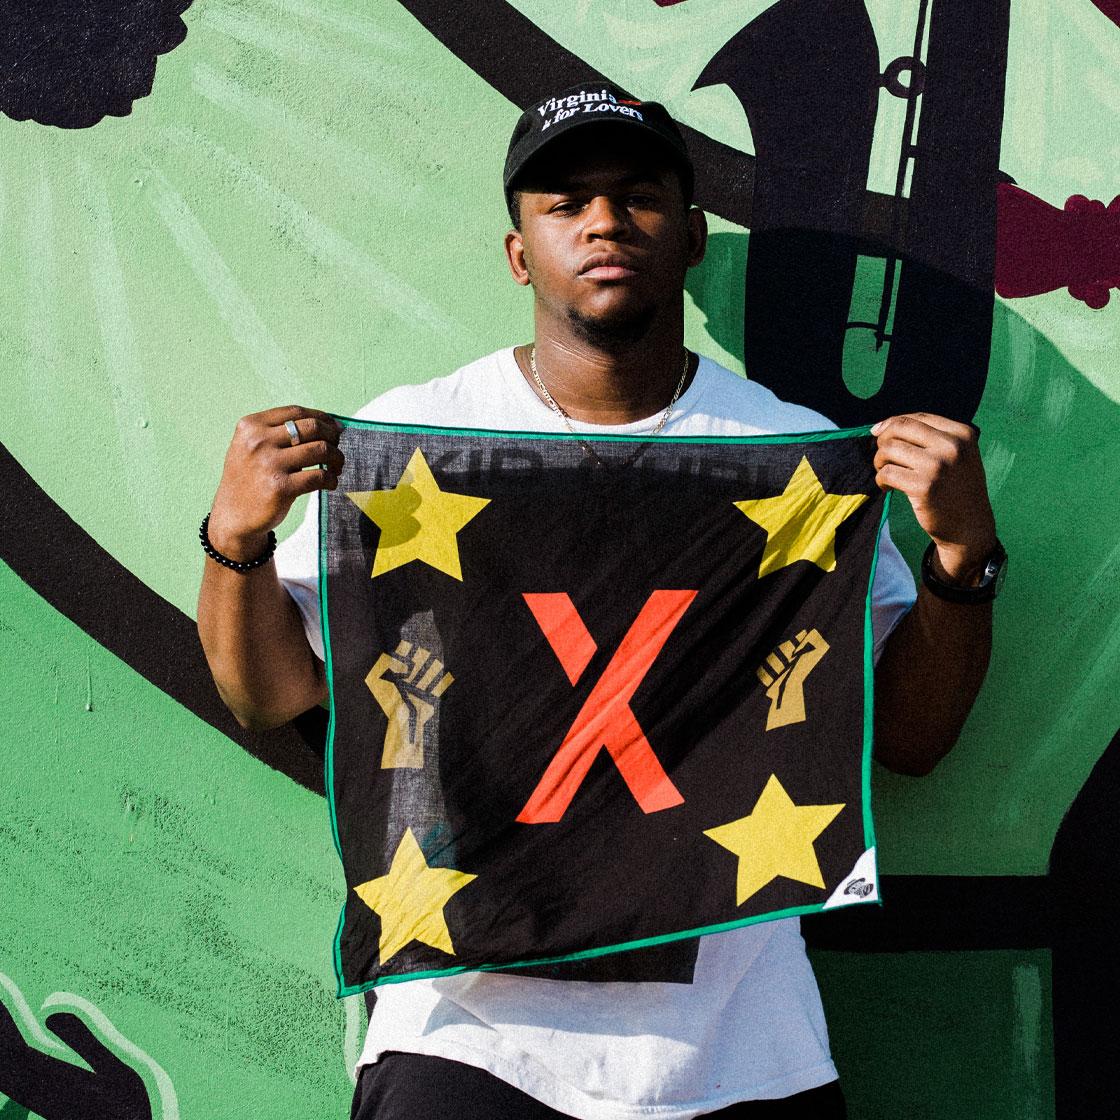 Odis Turner III holding up his design of the JXTA flag bandana